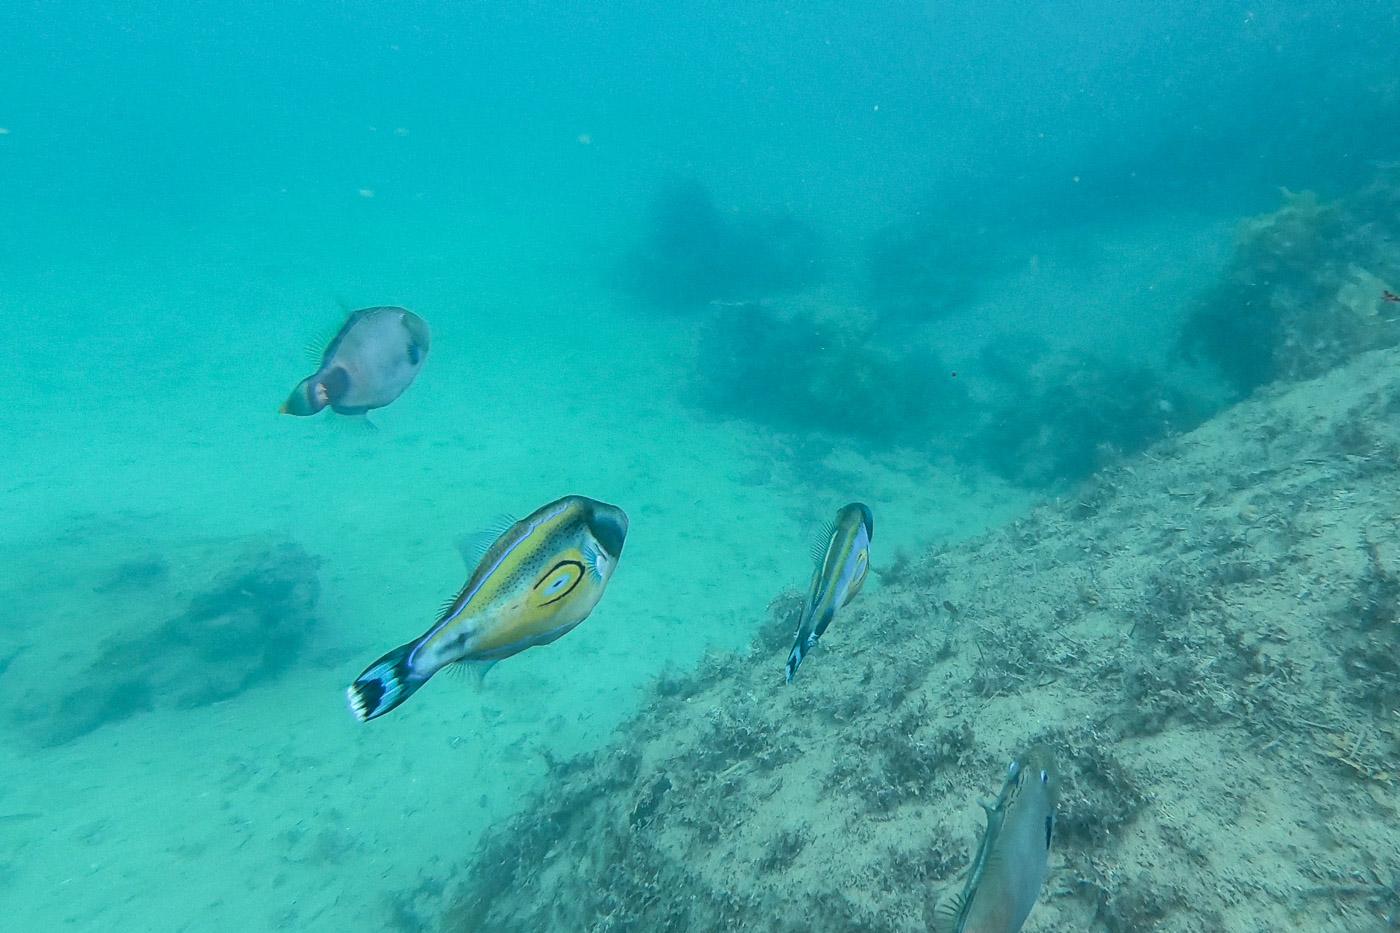 Port Noarlunga Snorkeling